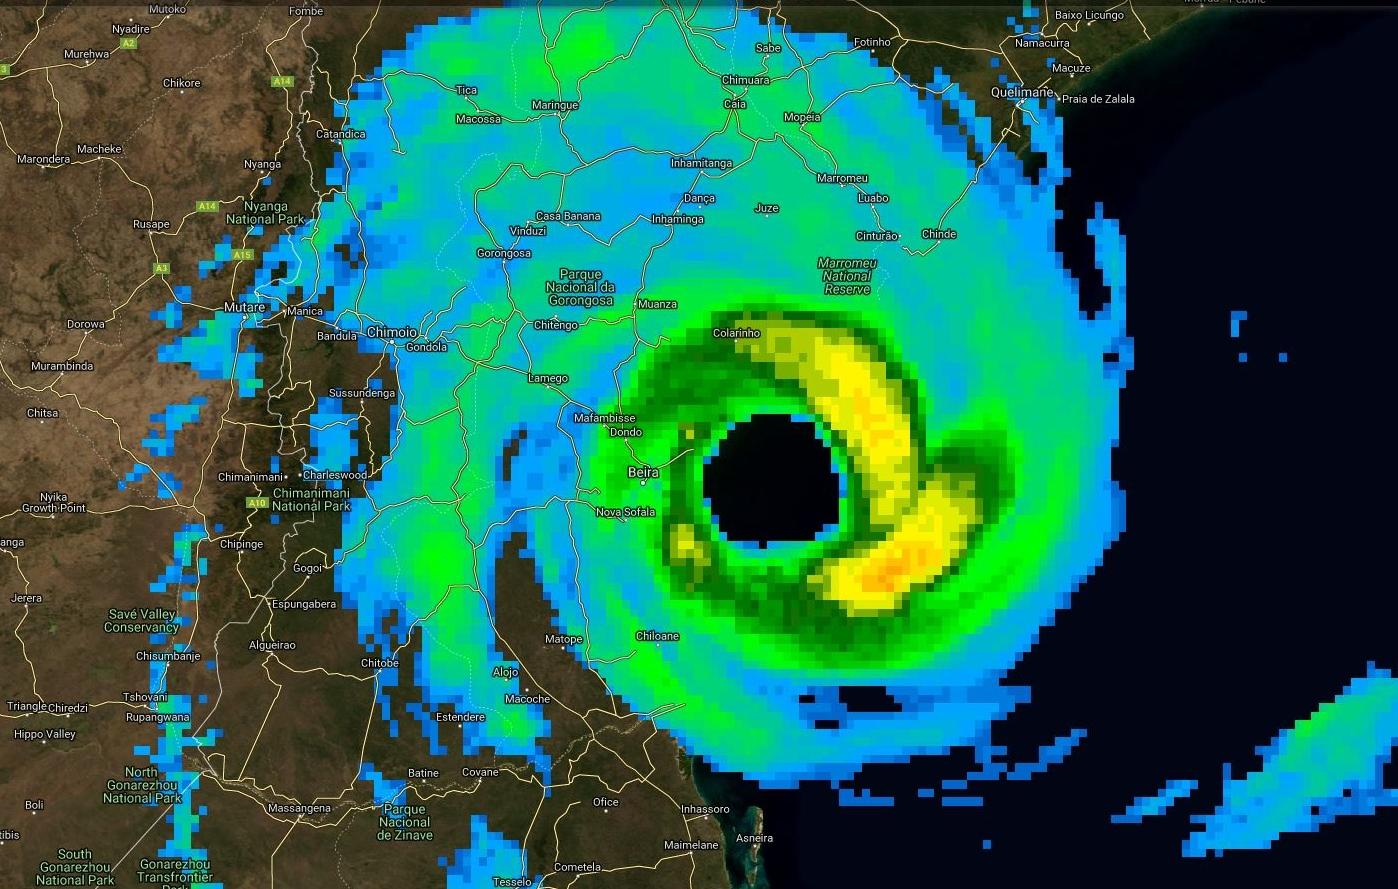 Image satellite de 22heures/Mascareignes qui redevient plutôt impressionnante.